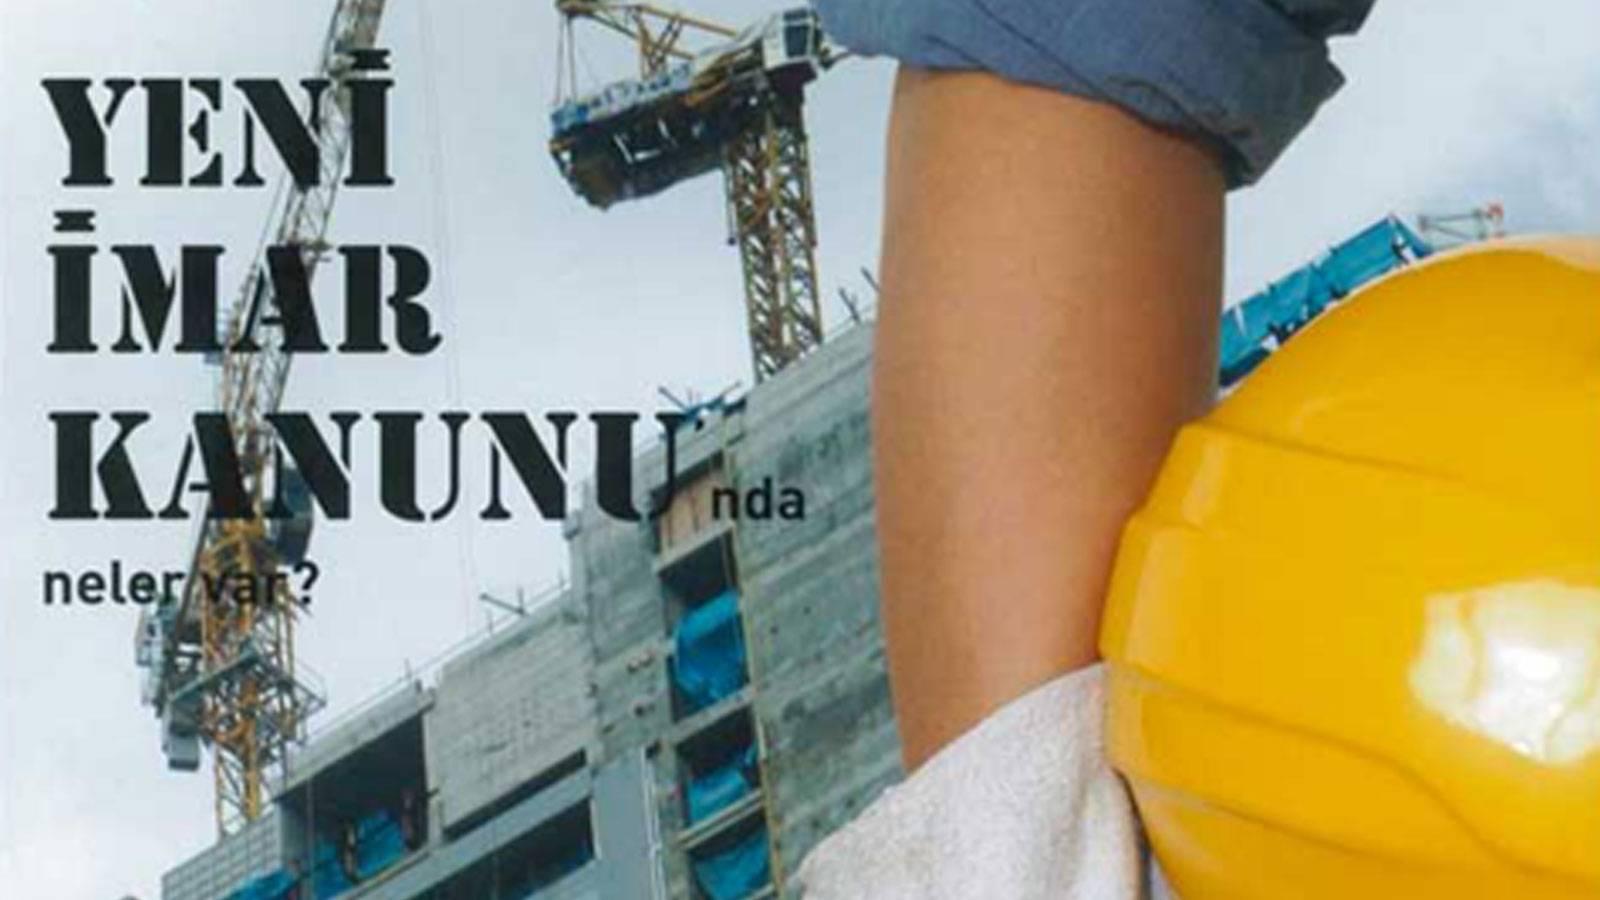 01.07.2013 Vadistanbul has been published in İnşaat & Yatırım Magazine